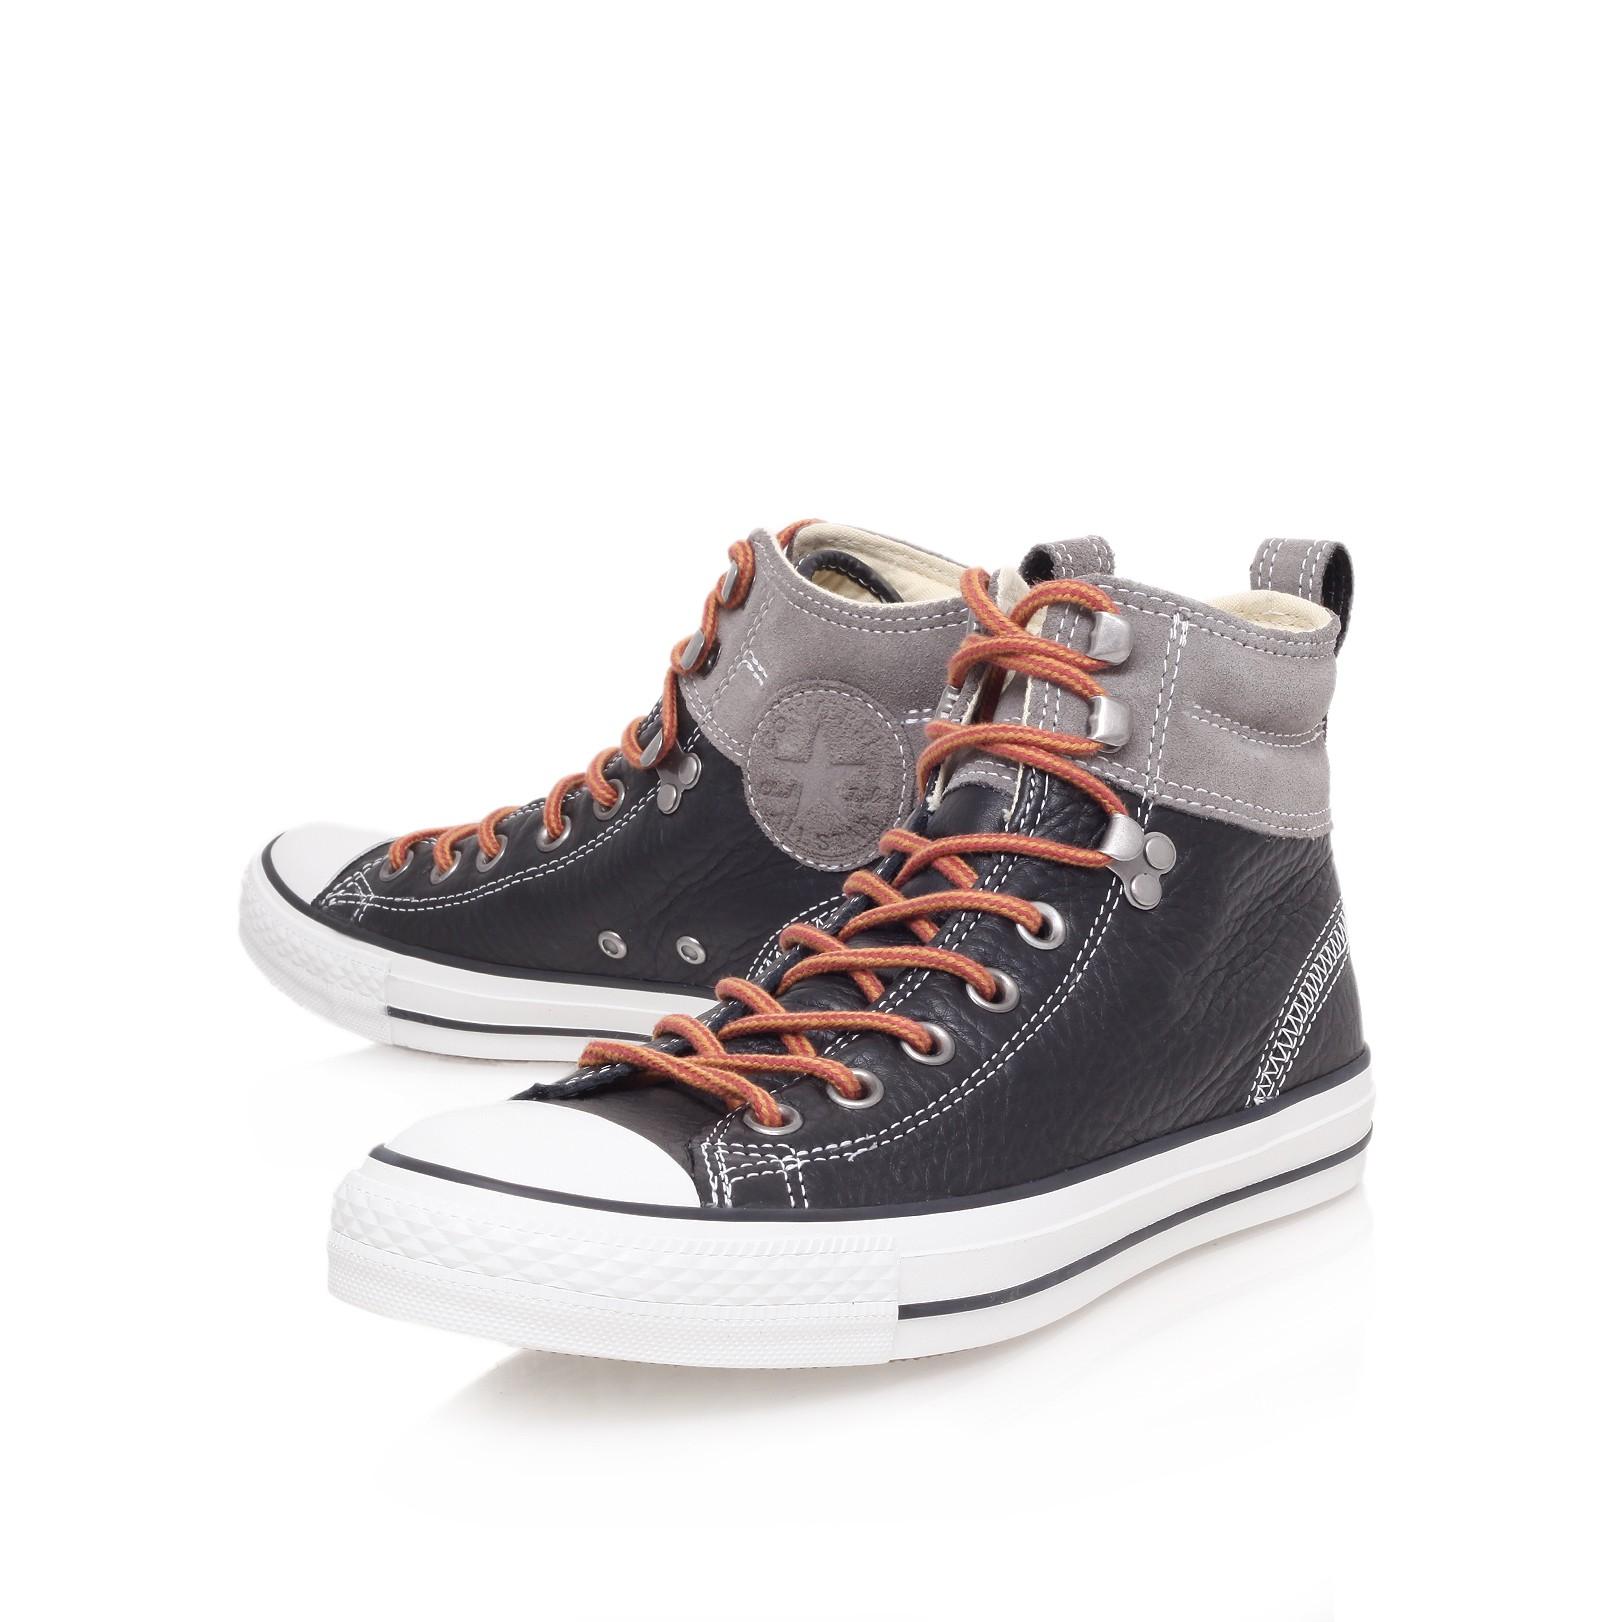 7f4f610d53f86c Converse Ctas Hiker 2 in Black for Men - Lyst